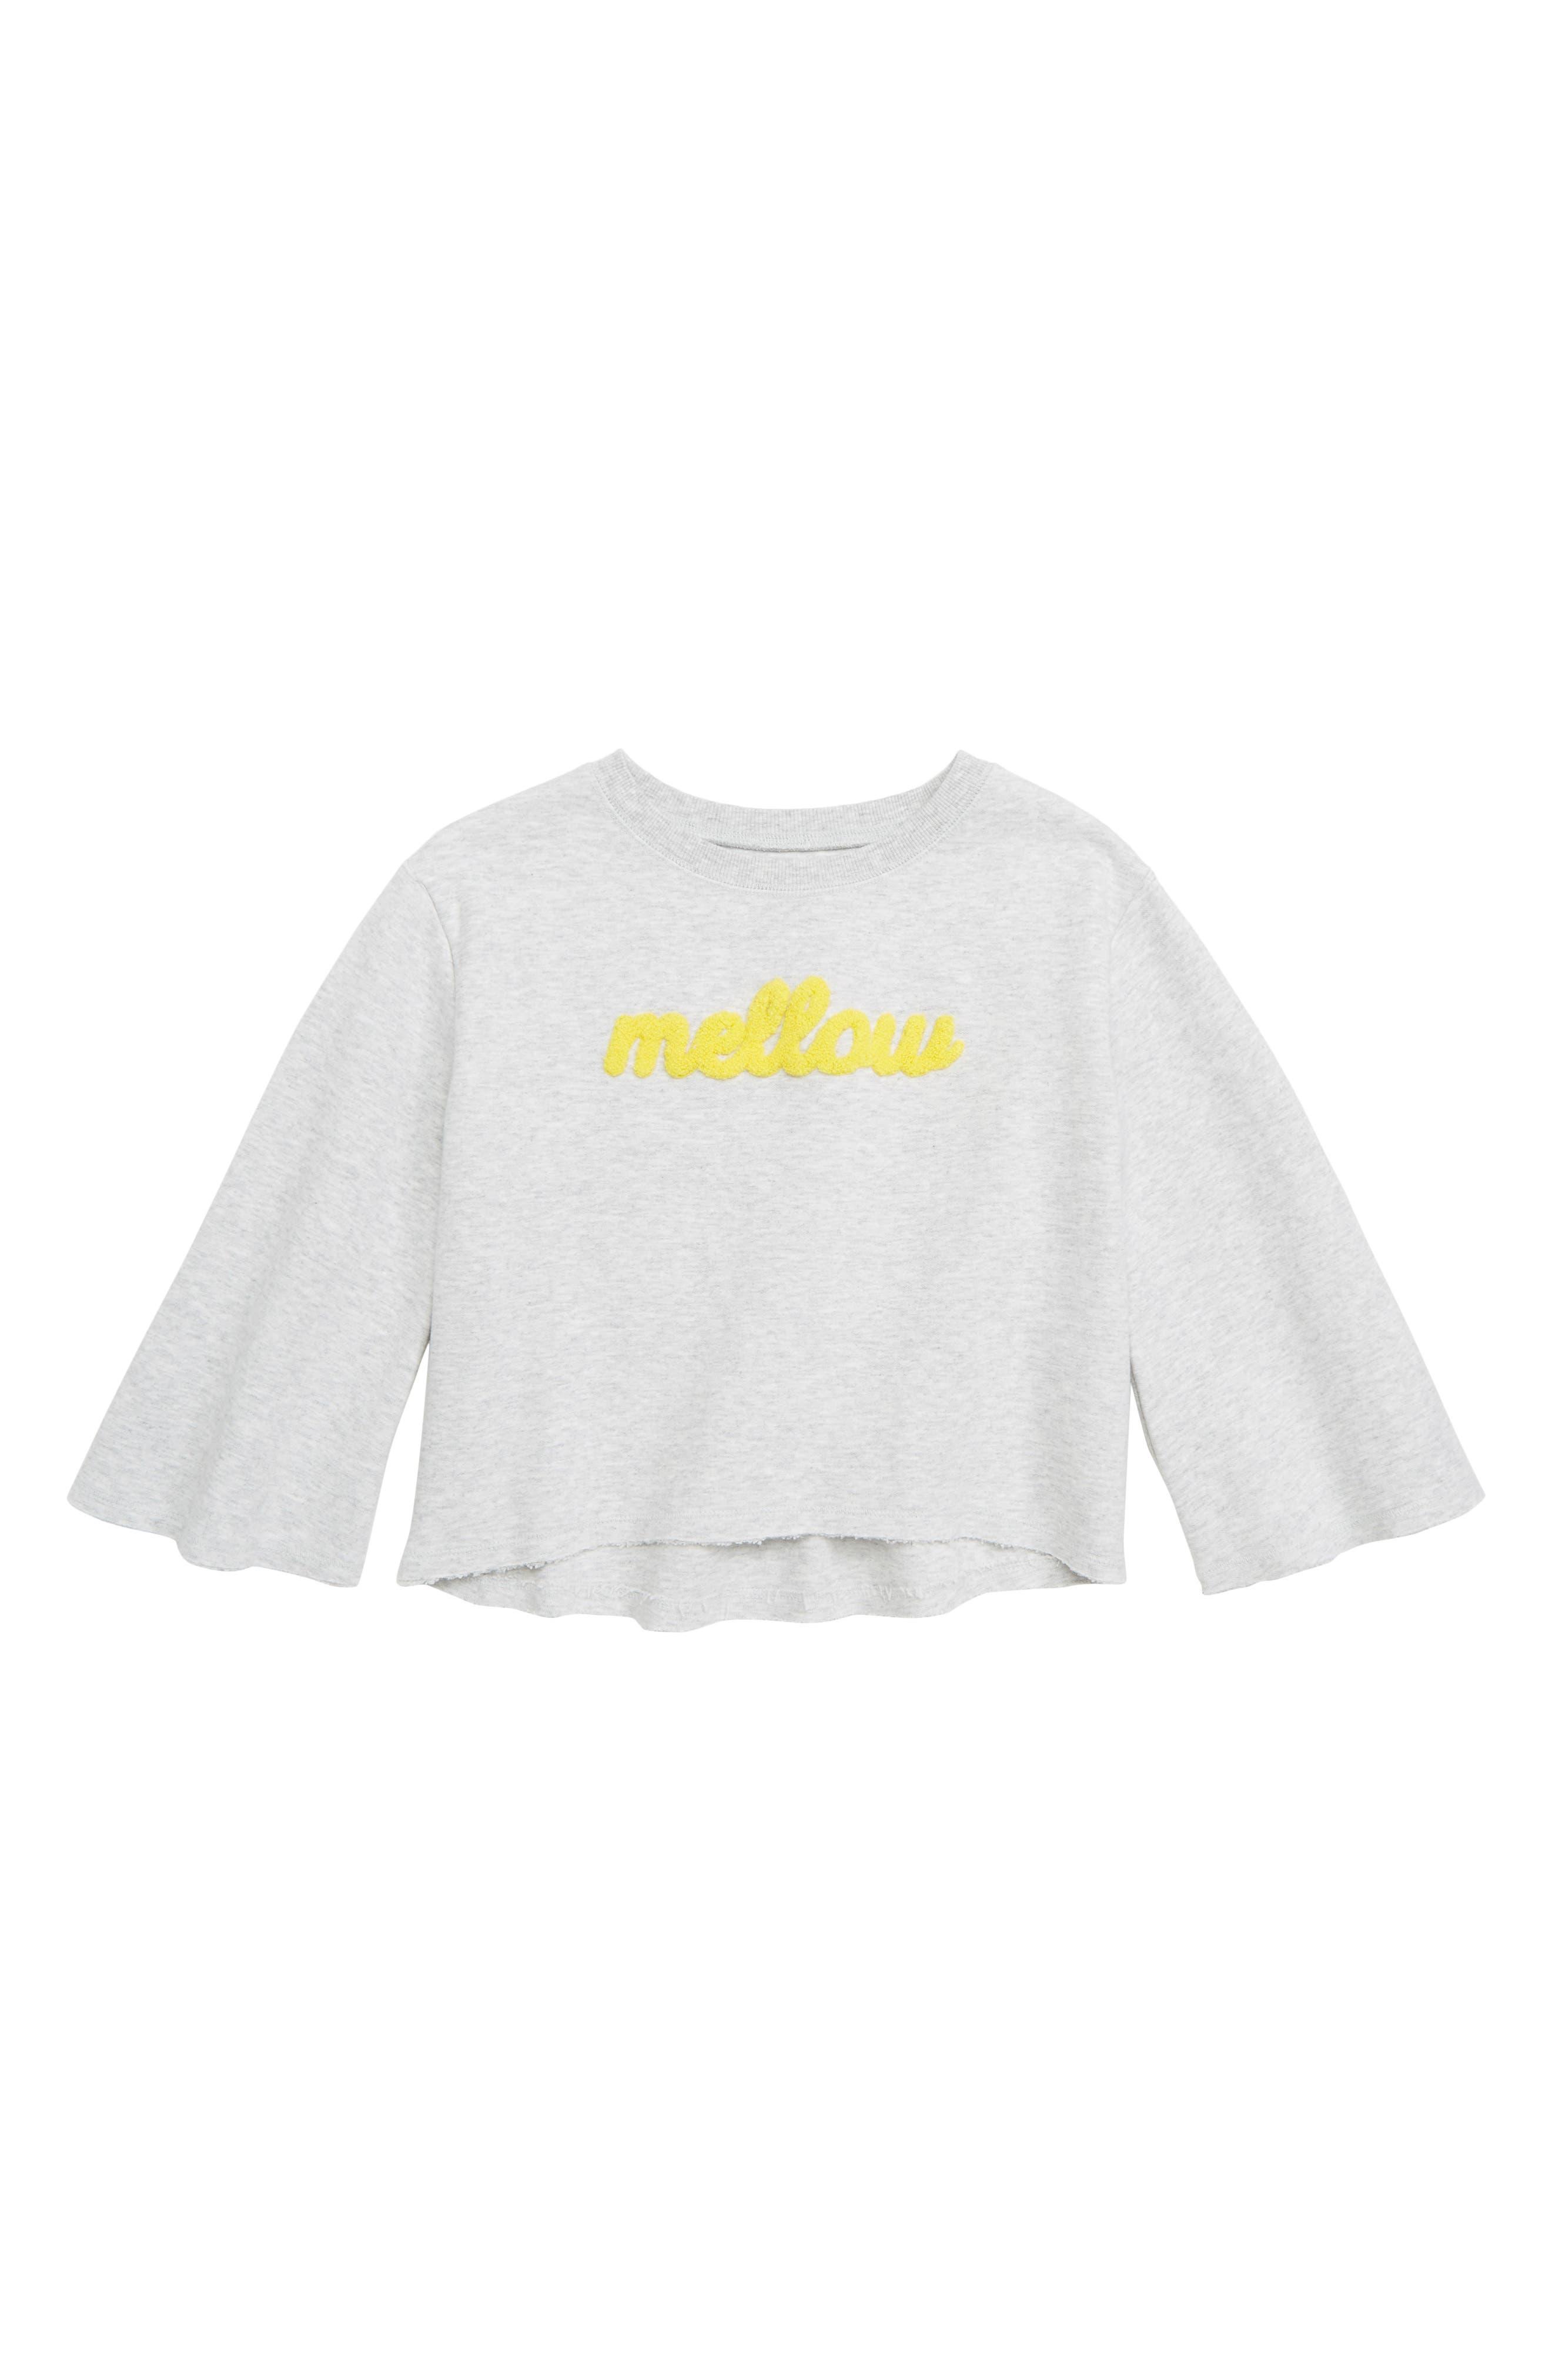 Flare Sleeve Sweatshirt,                         Main,                         color, GREY ASH HEATHER MELLOW